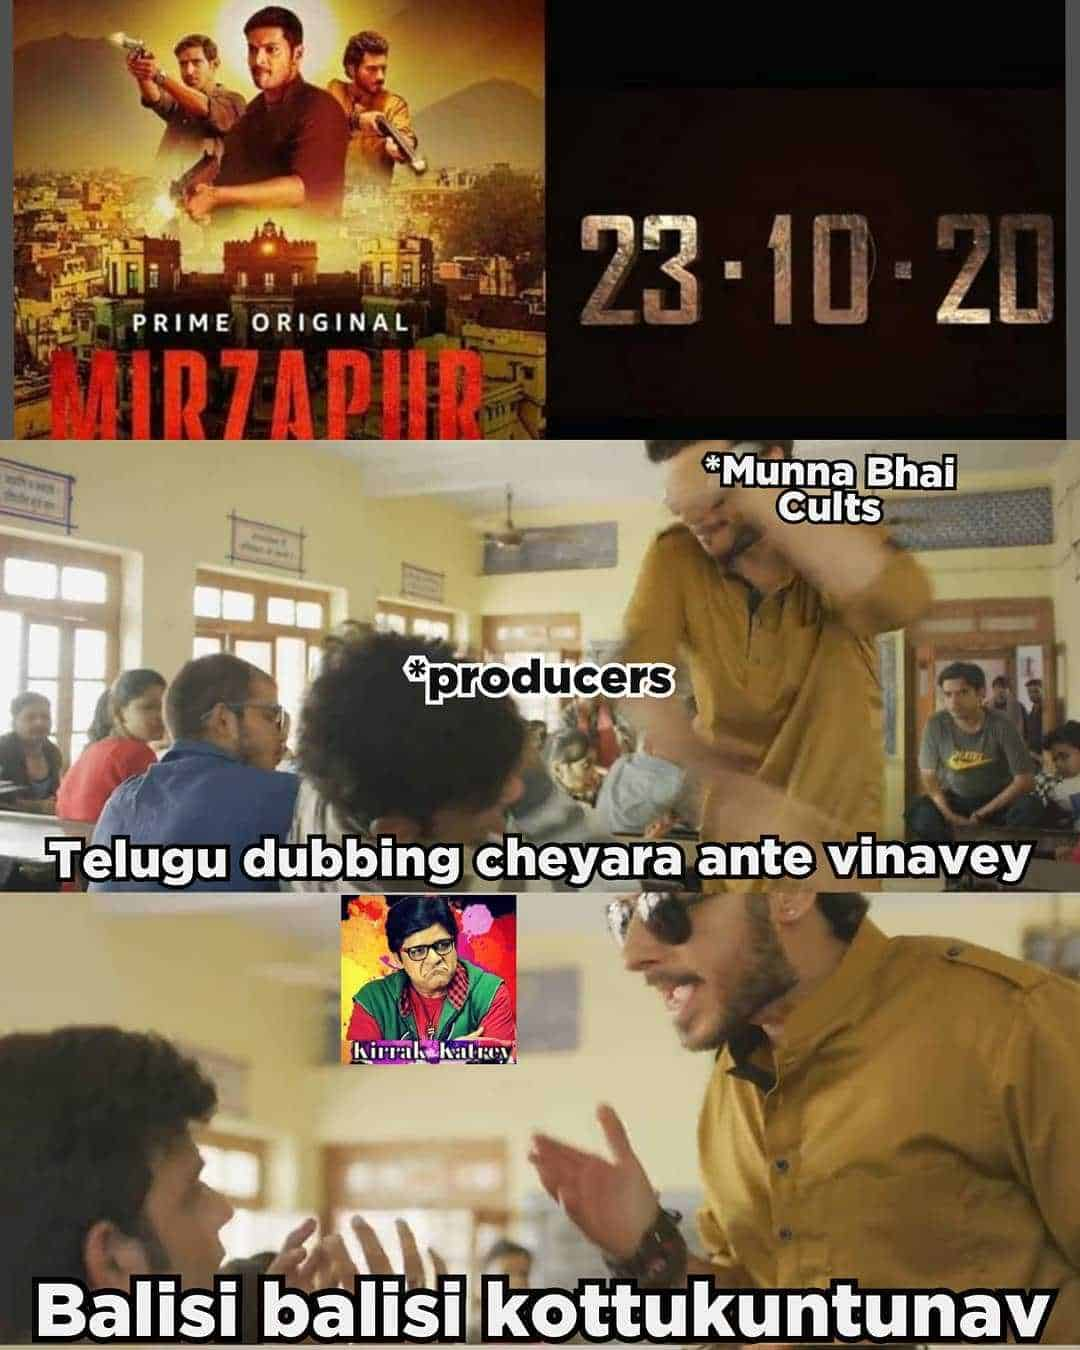 3. Mirzapur 2 Memes